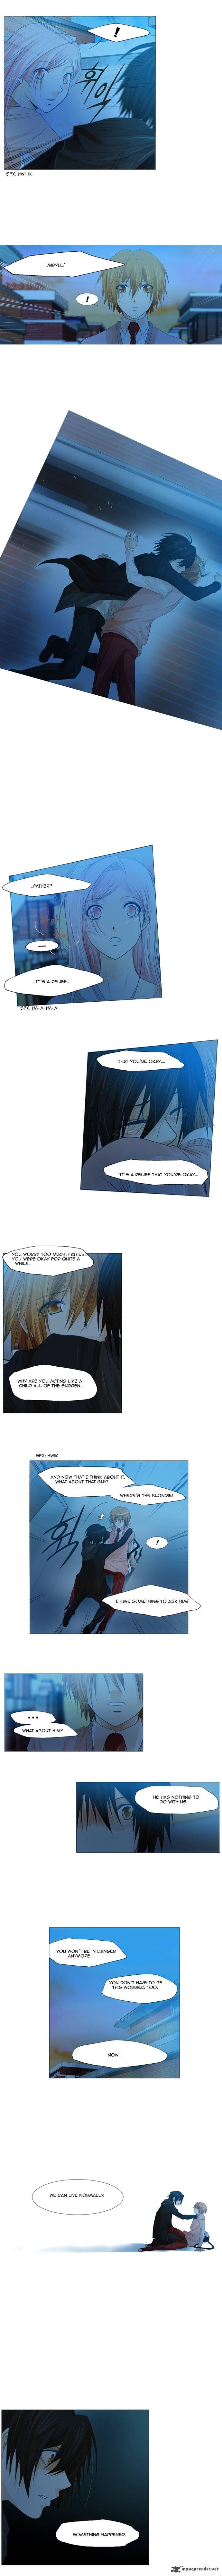 under PRIN 58 Page 2